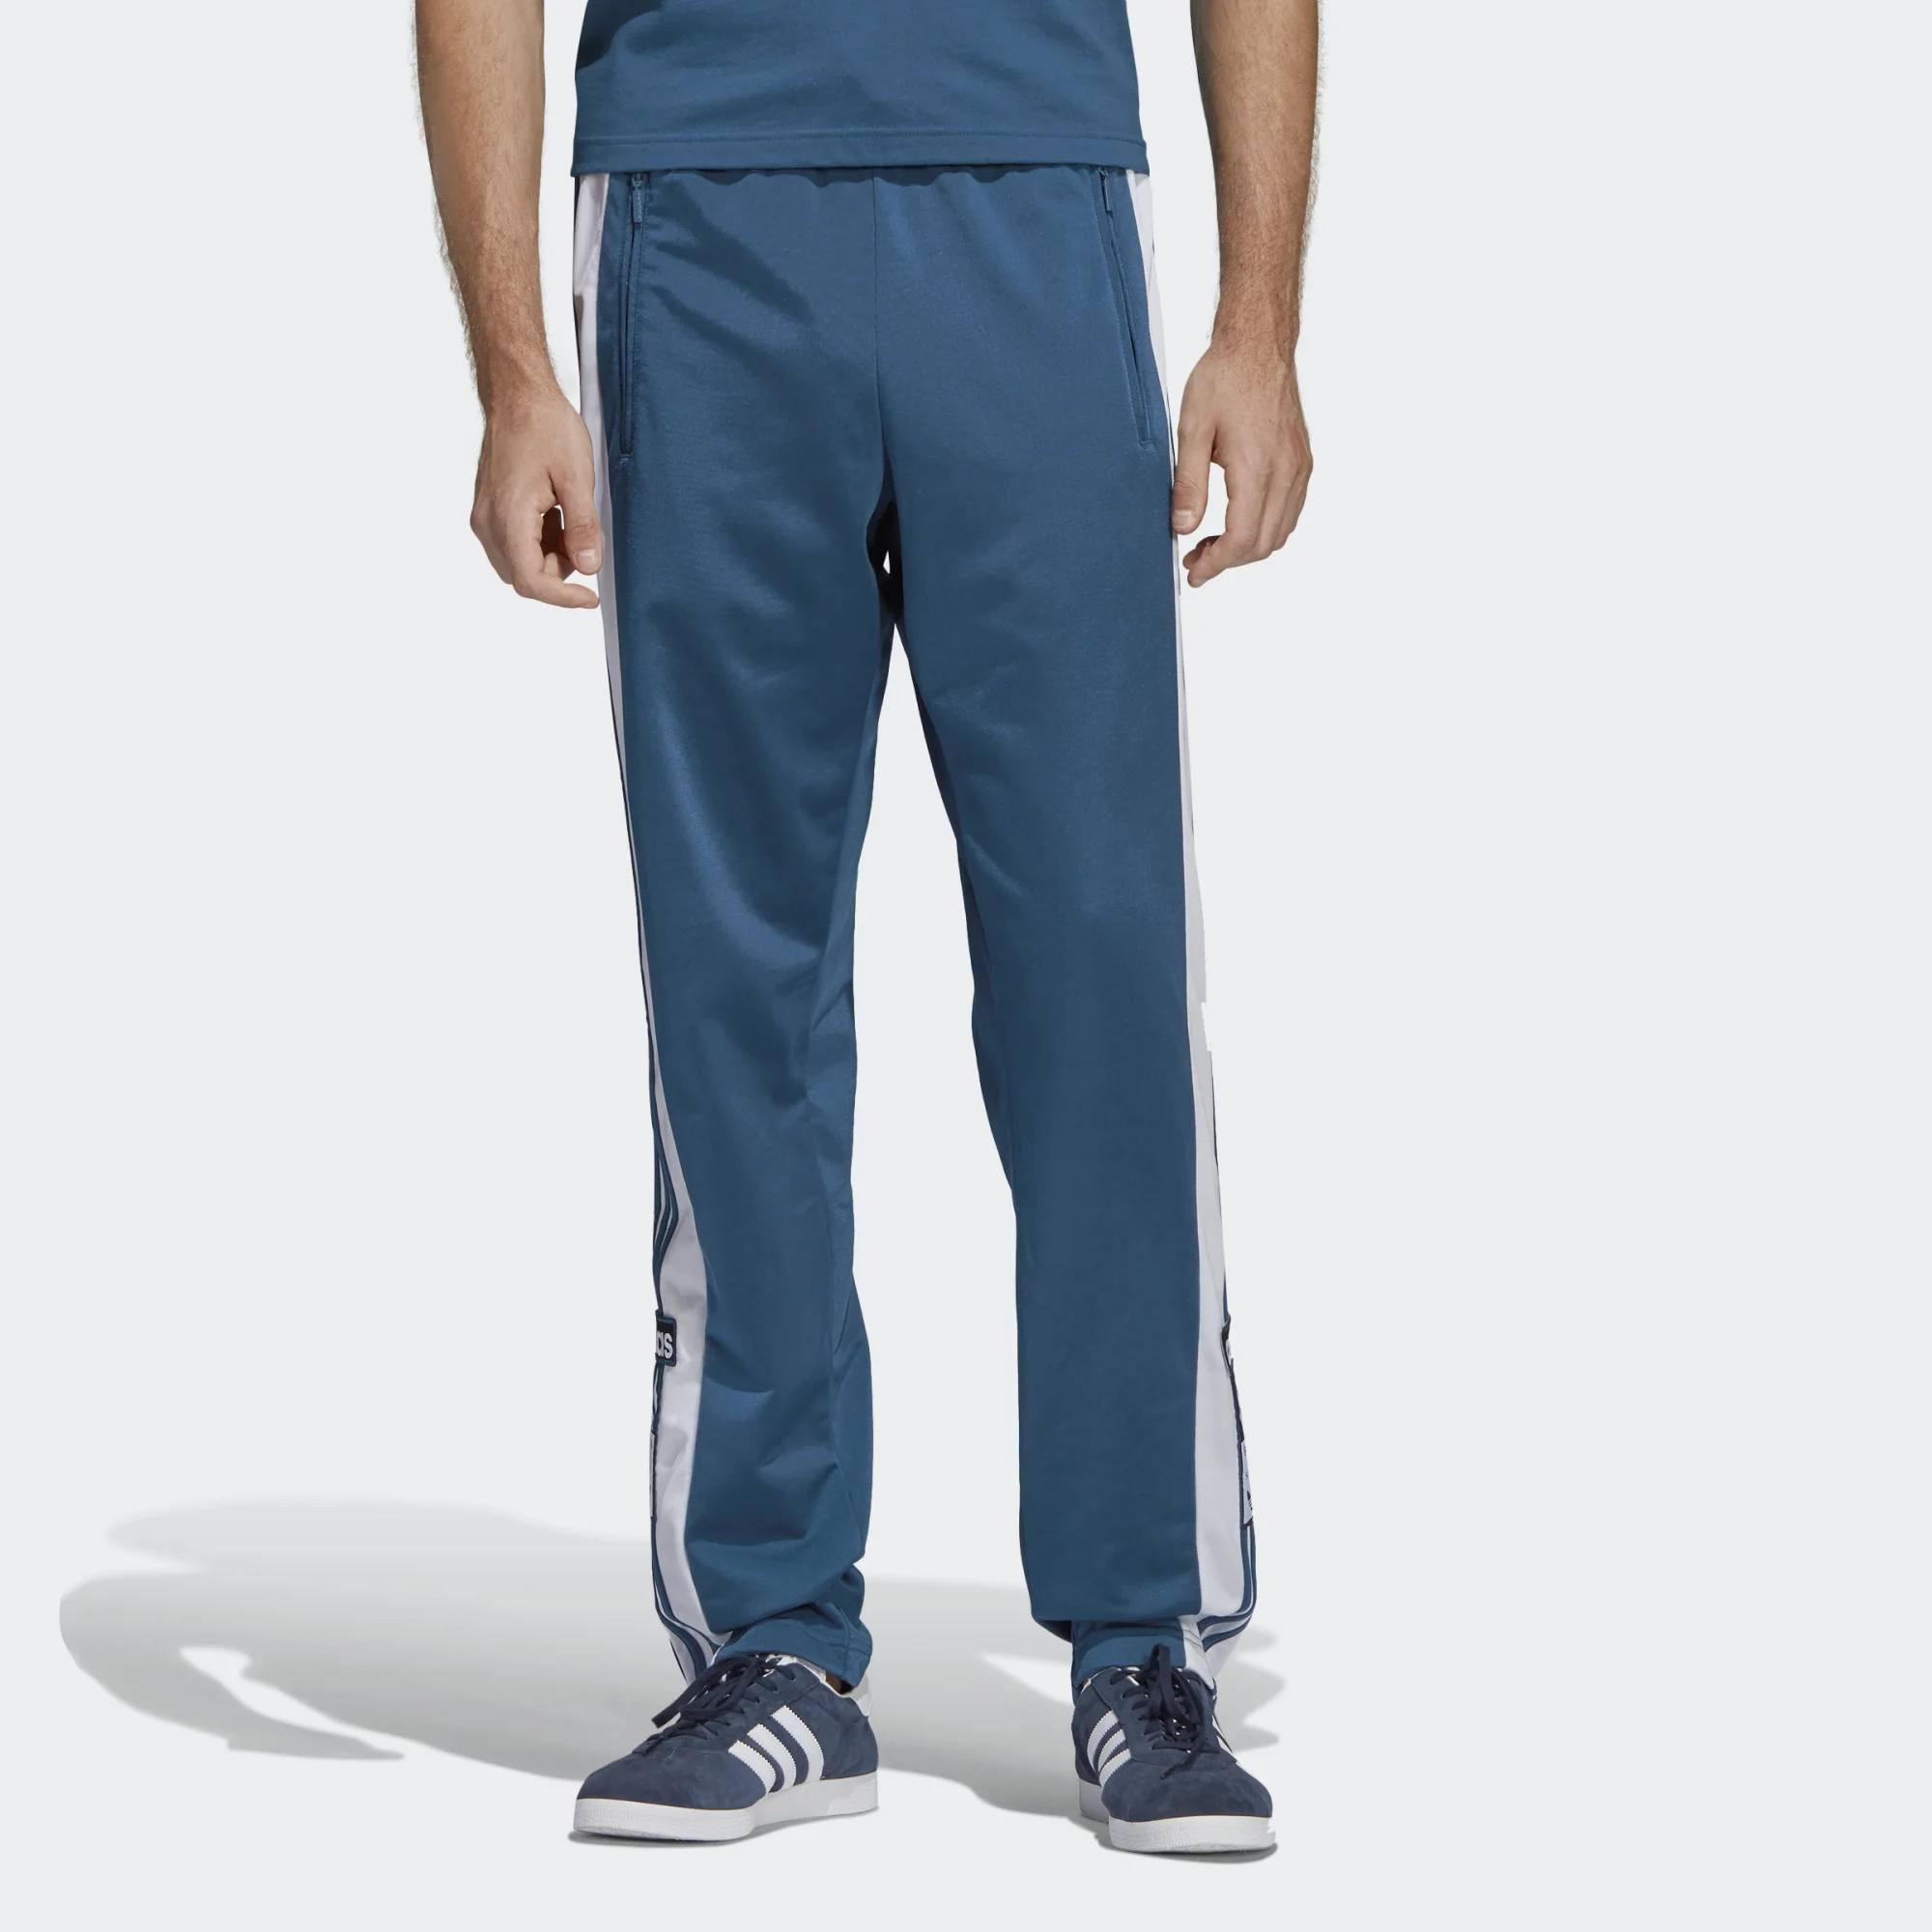 adidas Original Adibreak Track Pants - Ανδρικό Παντελόνι (9000022595_36755)